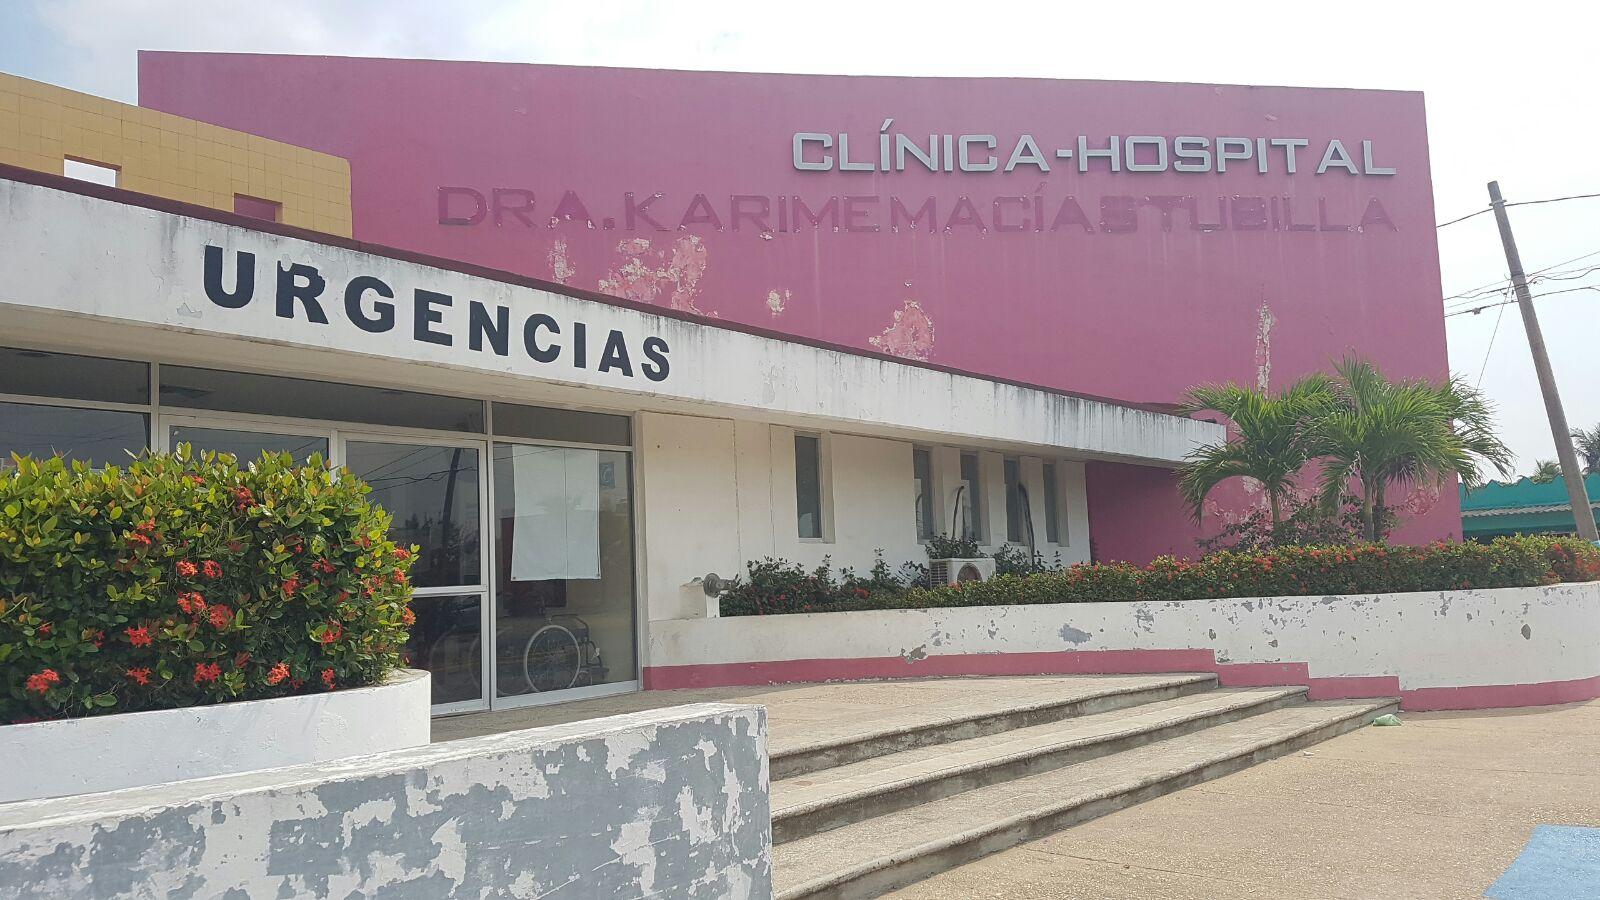 Retiran nombre de Karime Macías en clínica-hospital de Villa Allende